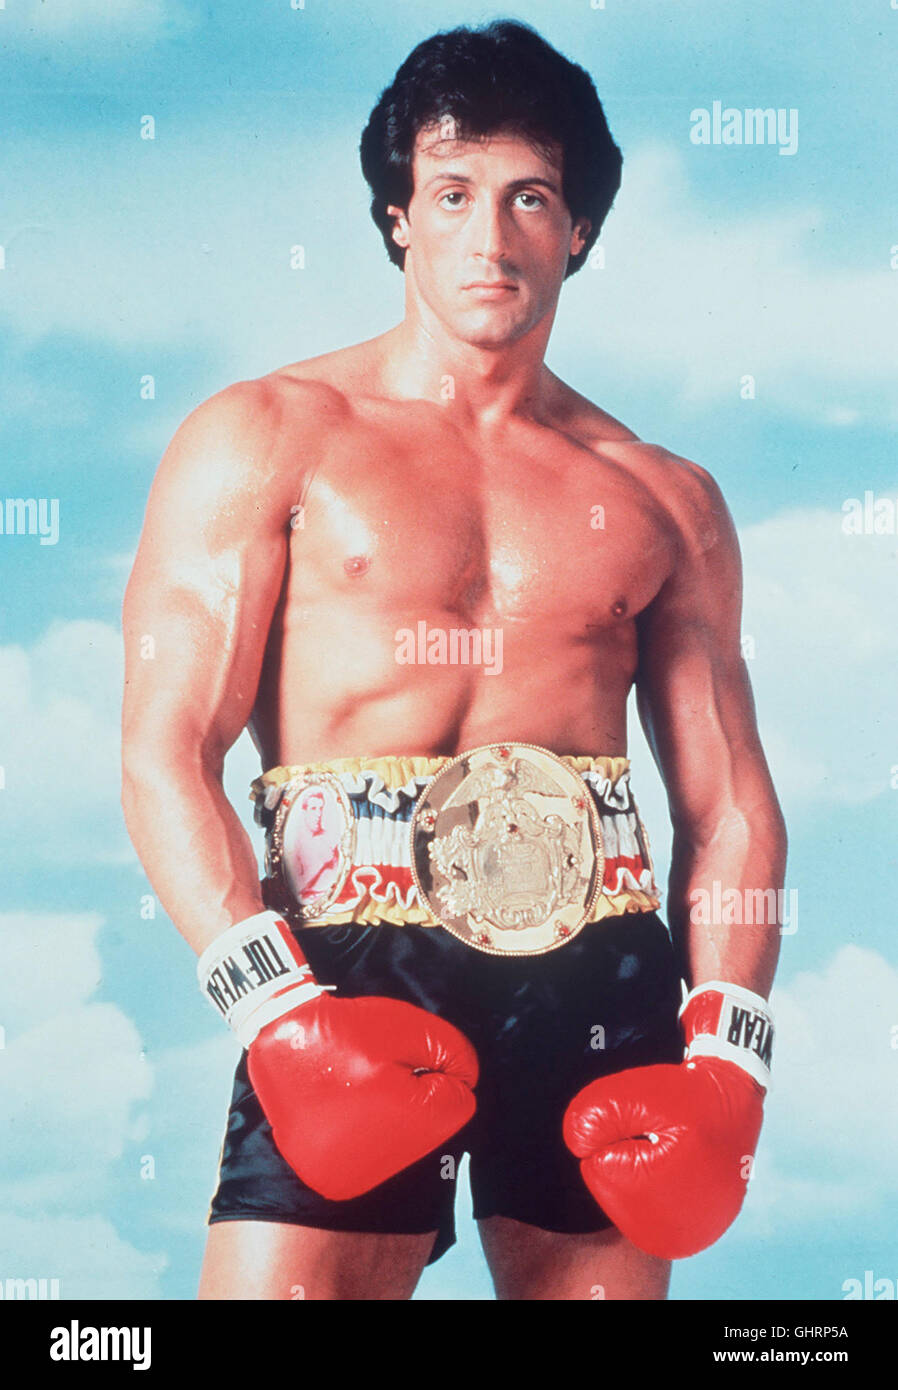 ROCKY III - DAS AUGE DES TIGERS SILVESTER STALLONE (Rocky Balboa) Regie: Sylvester Stallone aka. Rocky III - Stock Image